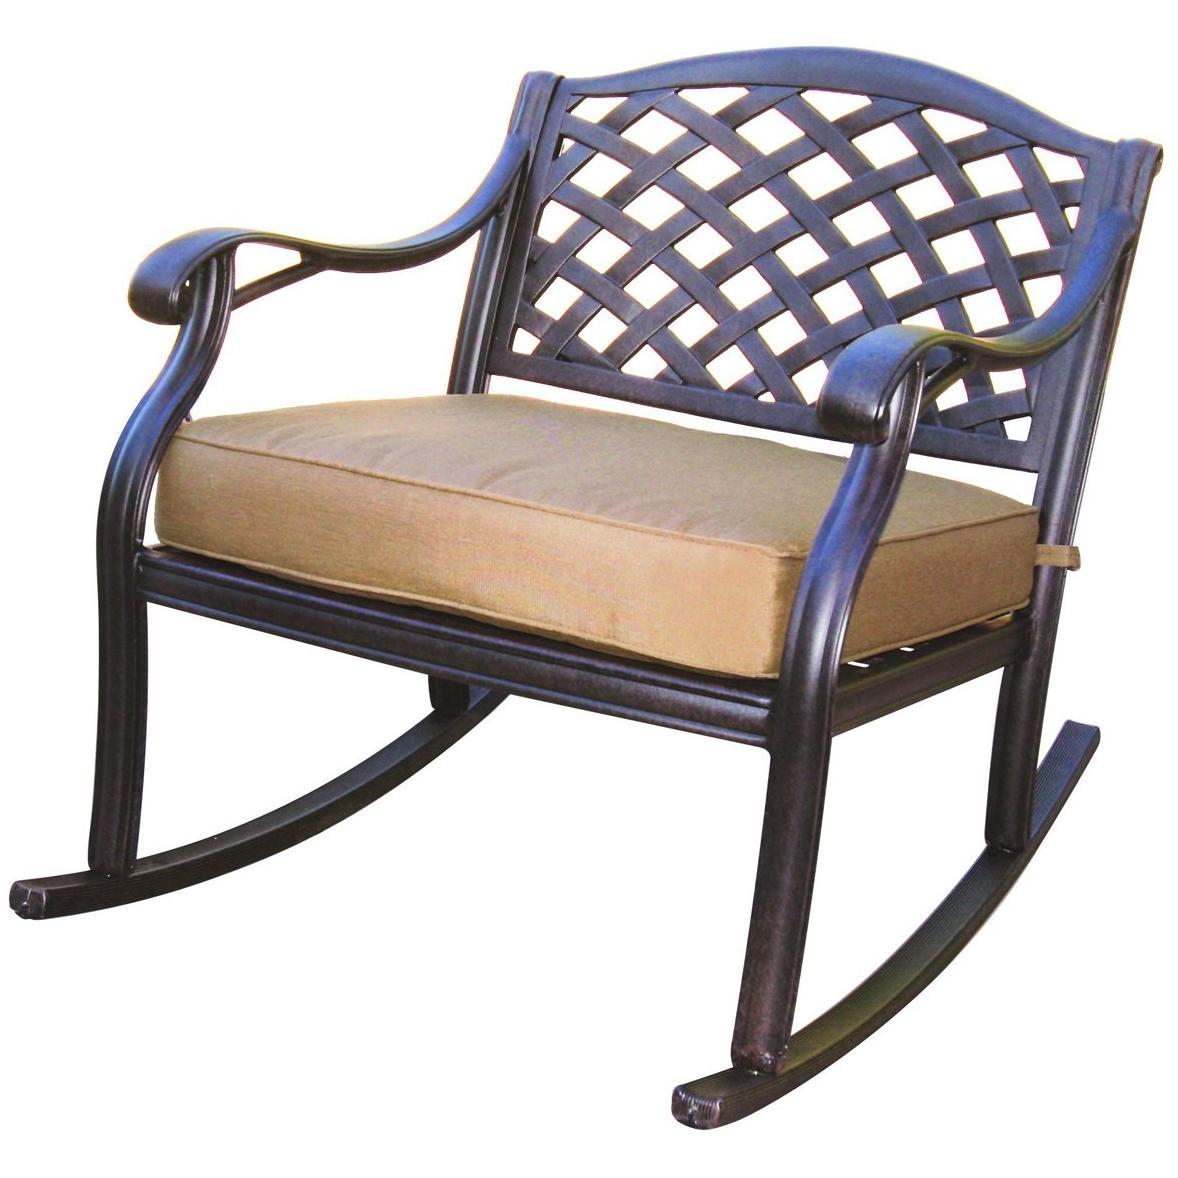 Darlee Nassau Cast Aluminum Outdoor Patio Club Rocker With Cushions - Antique Bronze